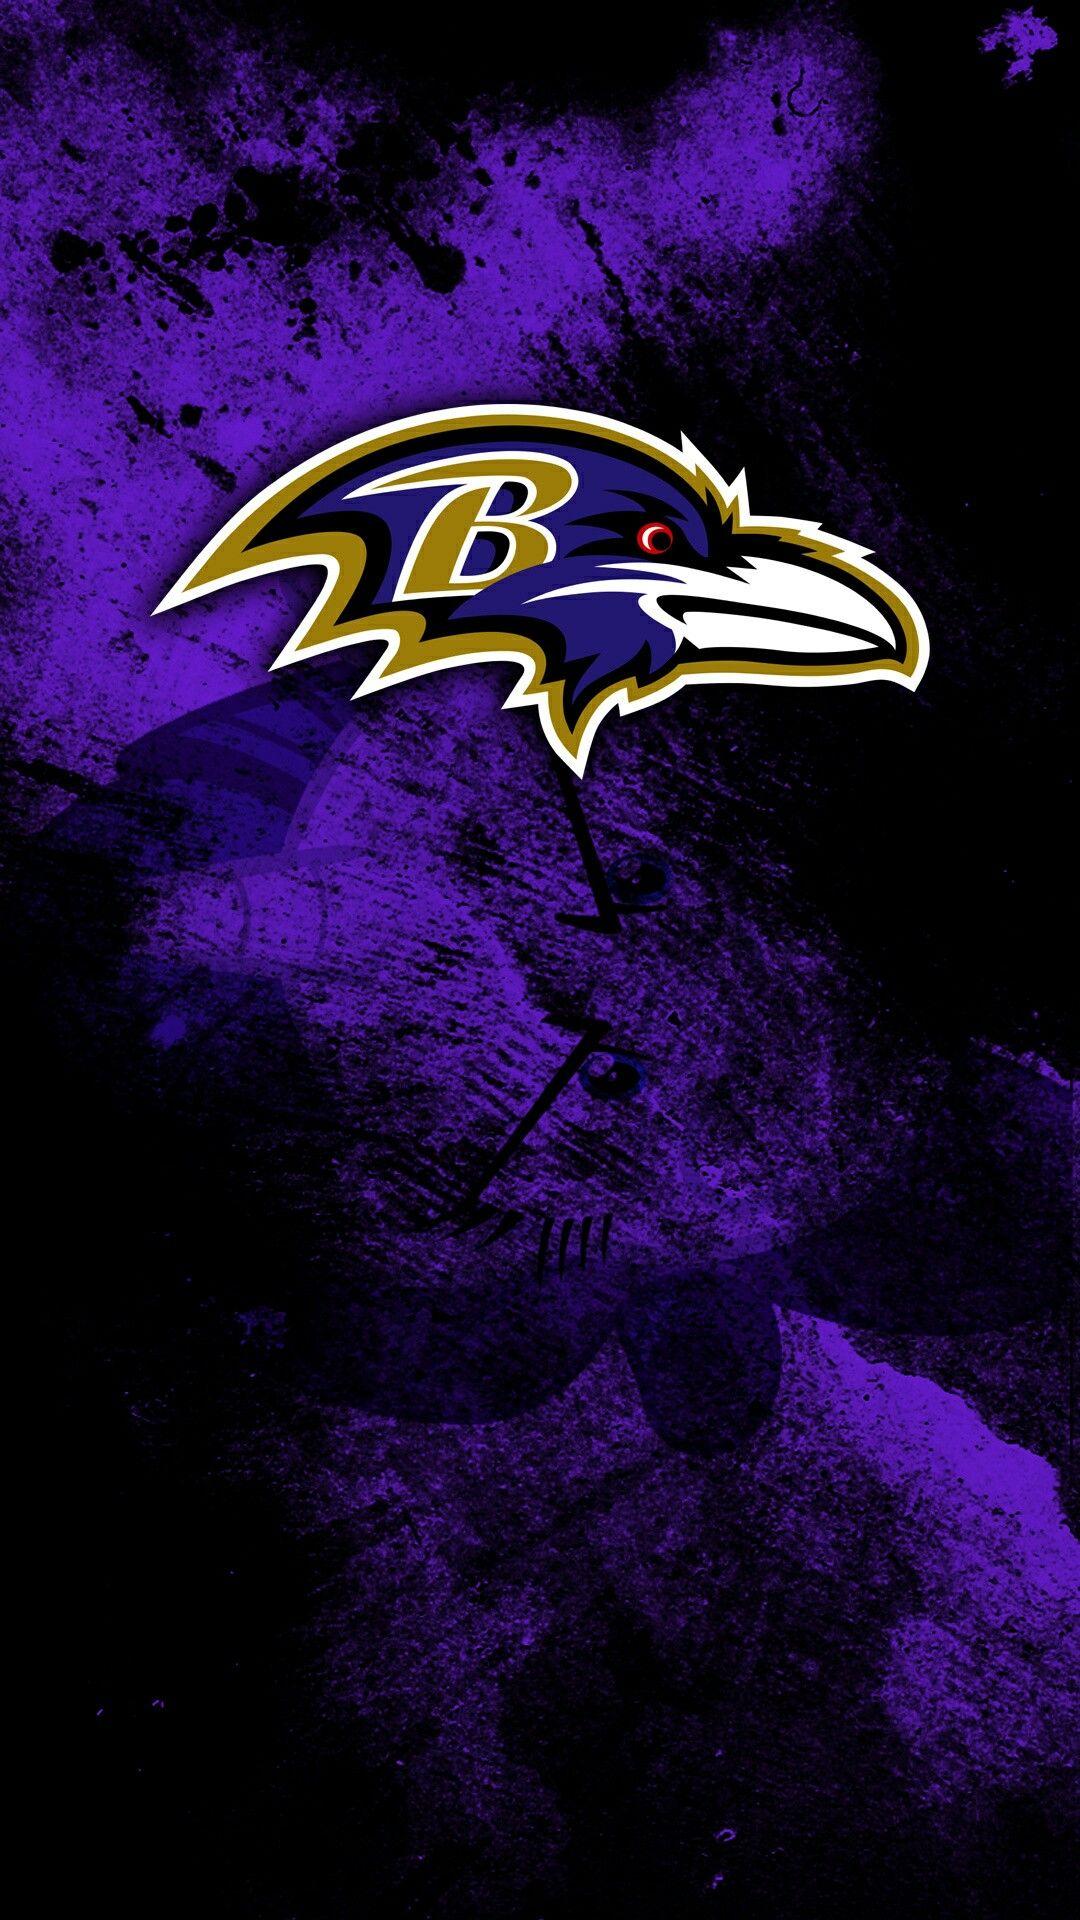 Baltimore Ravens Baltimore Ravens Logo Baltimore Ravens Wallpapers Baltimore Ravens Football